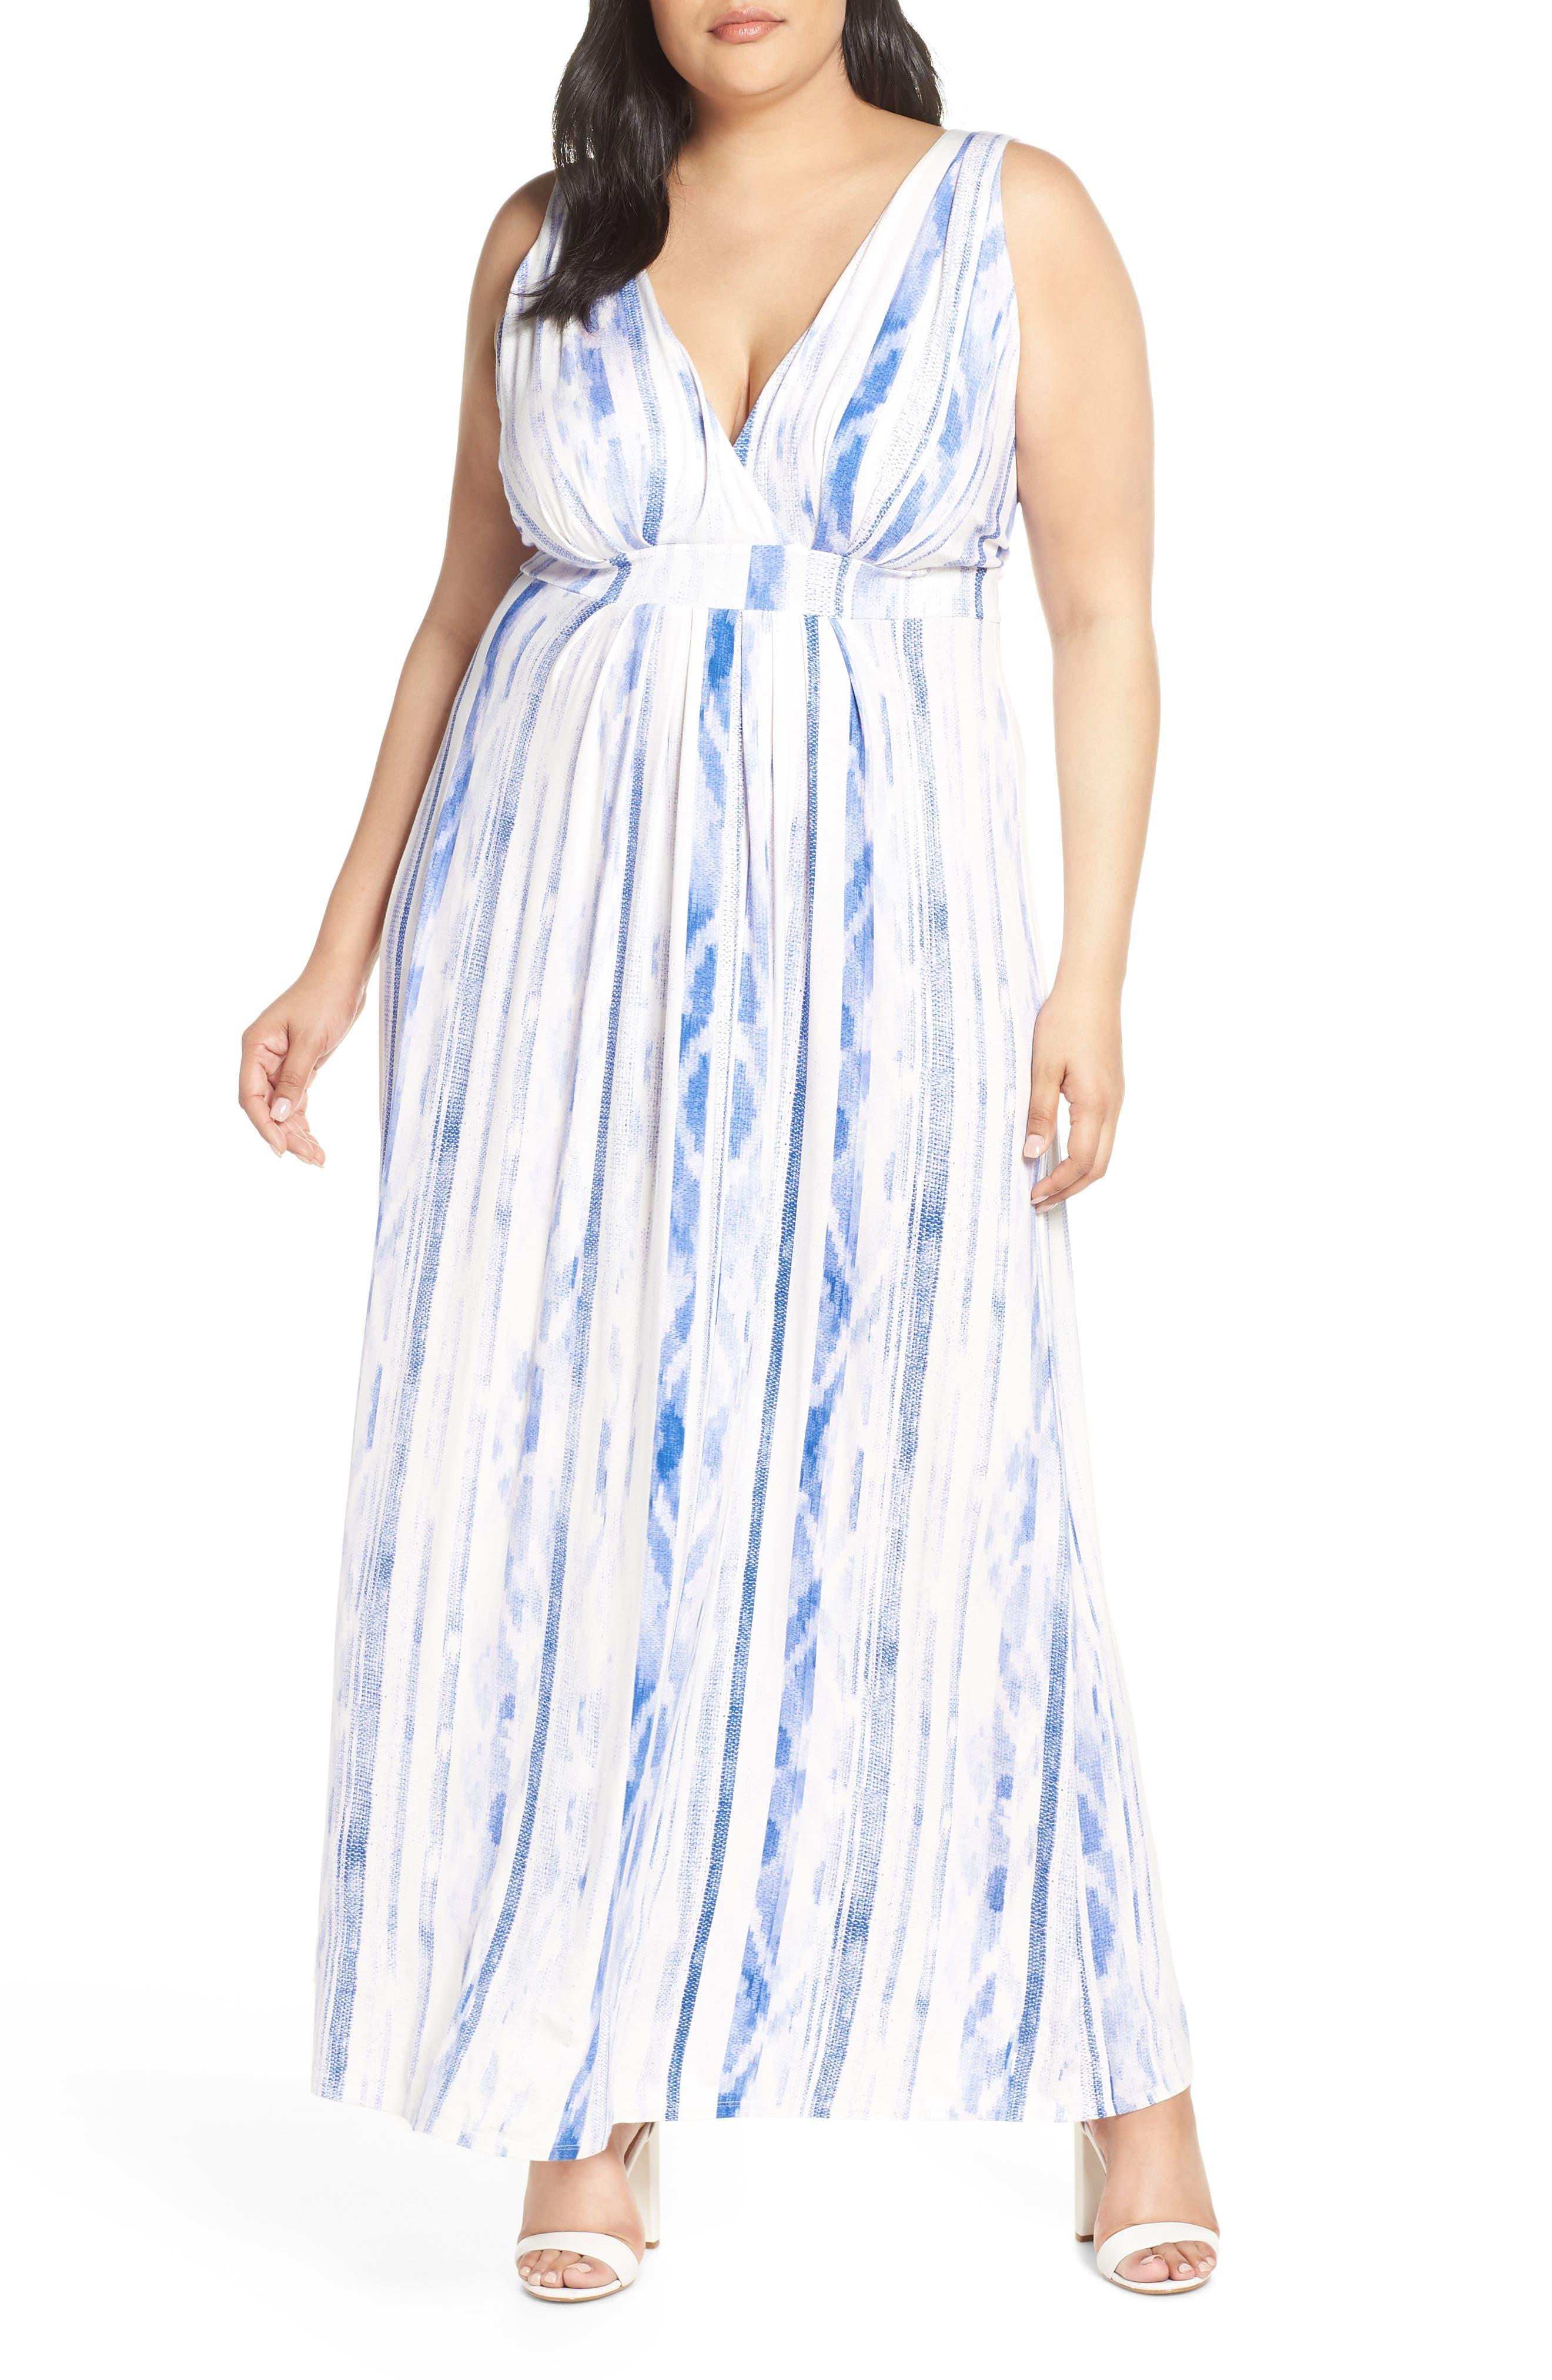 Plus Size Lemon Tart Chloe Maxi Dress, White